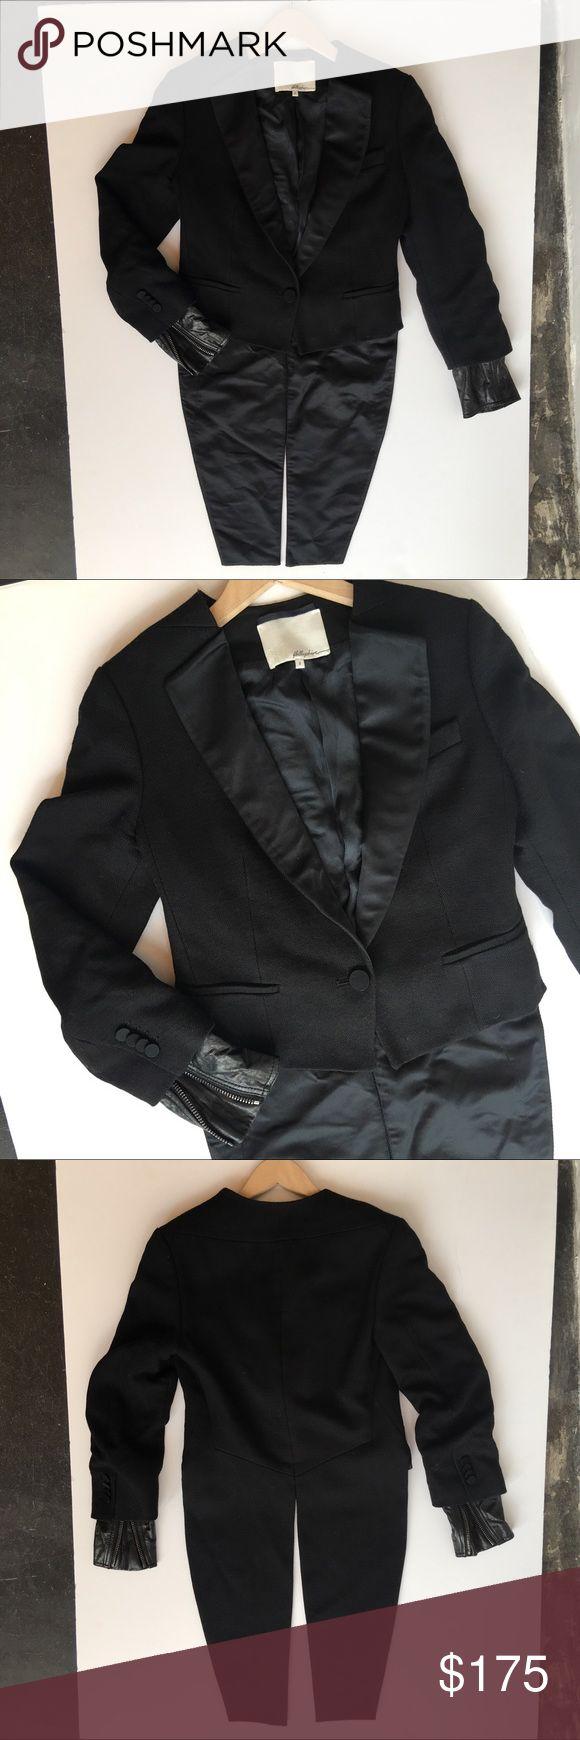 3.1 Phillip Lim Tuxedo Tail Leather Cuff Jacket Wool Tuxedo Tail Jacket with Removable Leather Moto Cuffs and Satin Lapels. Single button closure. 3.1 Phillip Lim Jackets & Coats Blazers